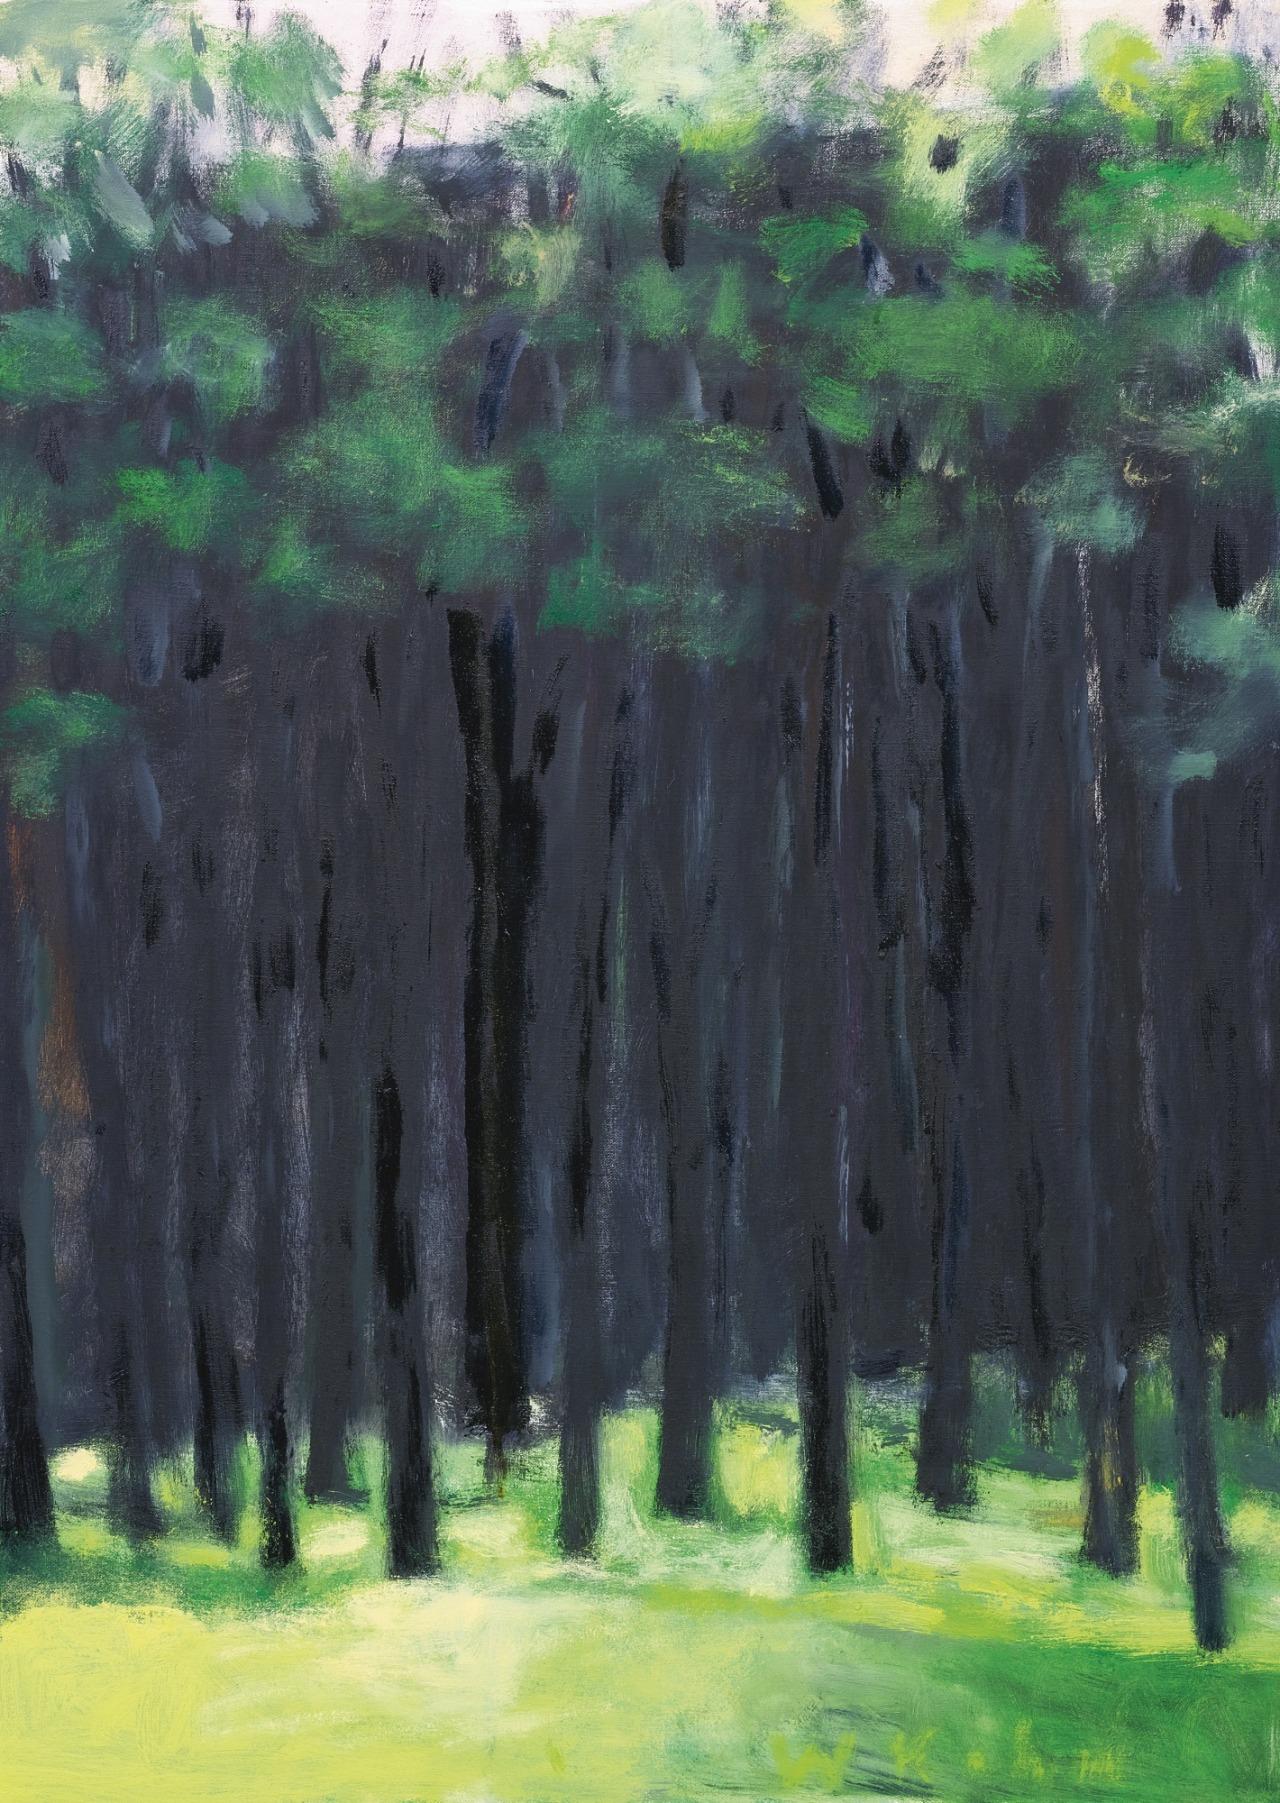 lawrenceleemagnuson:  Wolf Kahn (USA b. 1927) Green and Black (2002) oil on canvas 73.6 x 53.5 cmhttp://www.wolfkahn.com/